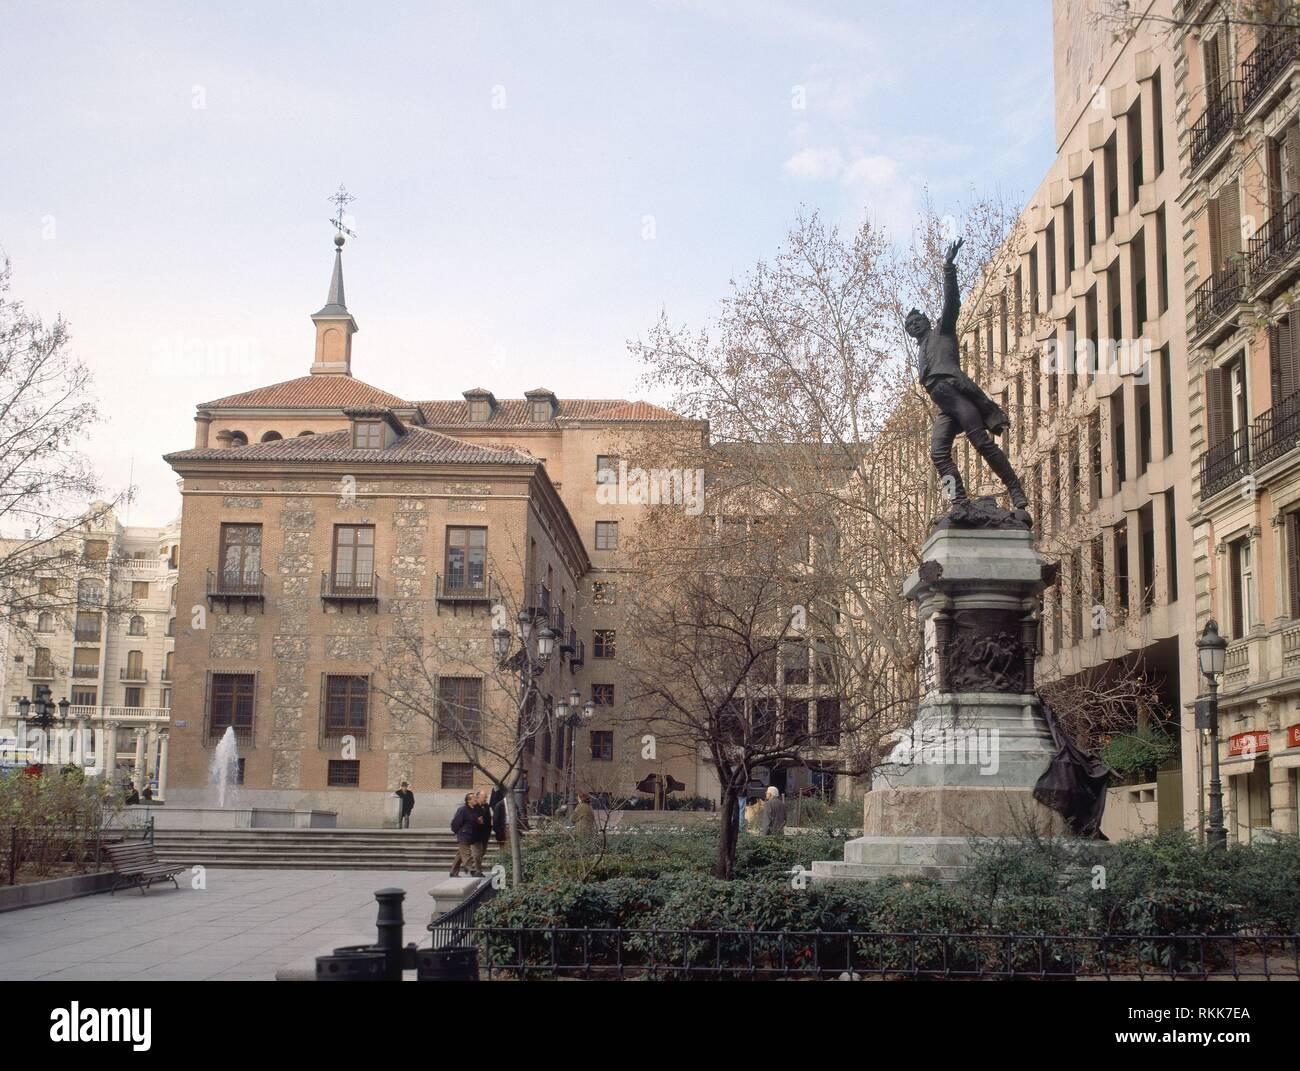 EXTERIOR-PLAZA DEL REY-MONUMENTO DEL TTE RUIZ(OBRA DE BENLLIURE)AL FONDO CASA 7 CHIMENEAS. Location: PLAZA DEL REY. SPAIN. - Stock Image